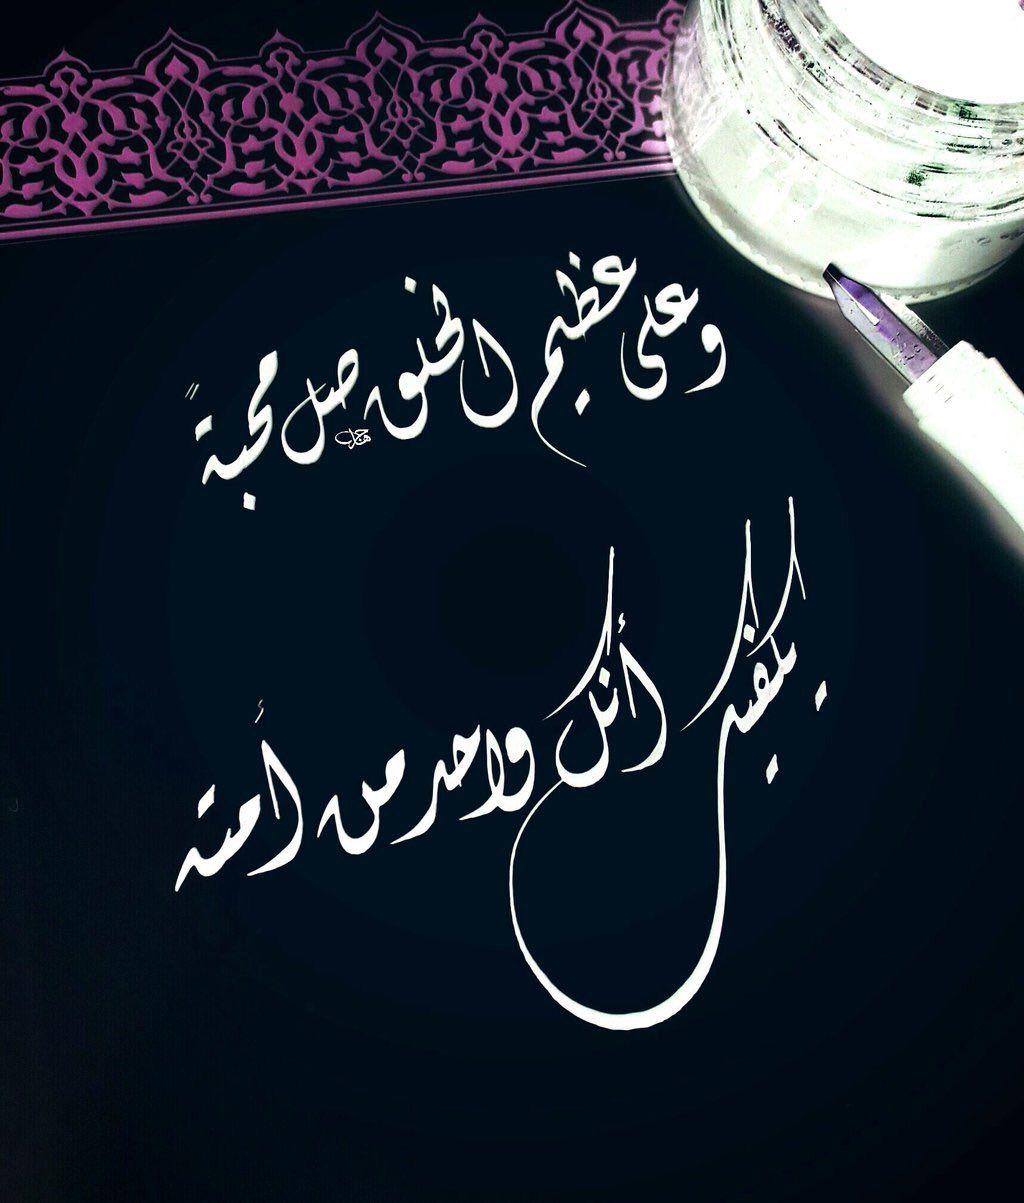 Twitter Islamic Calligraphy Spiritual Stories Photo Quotes